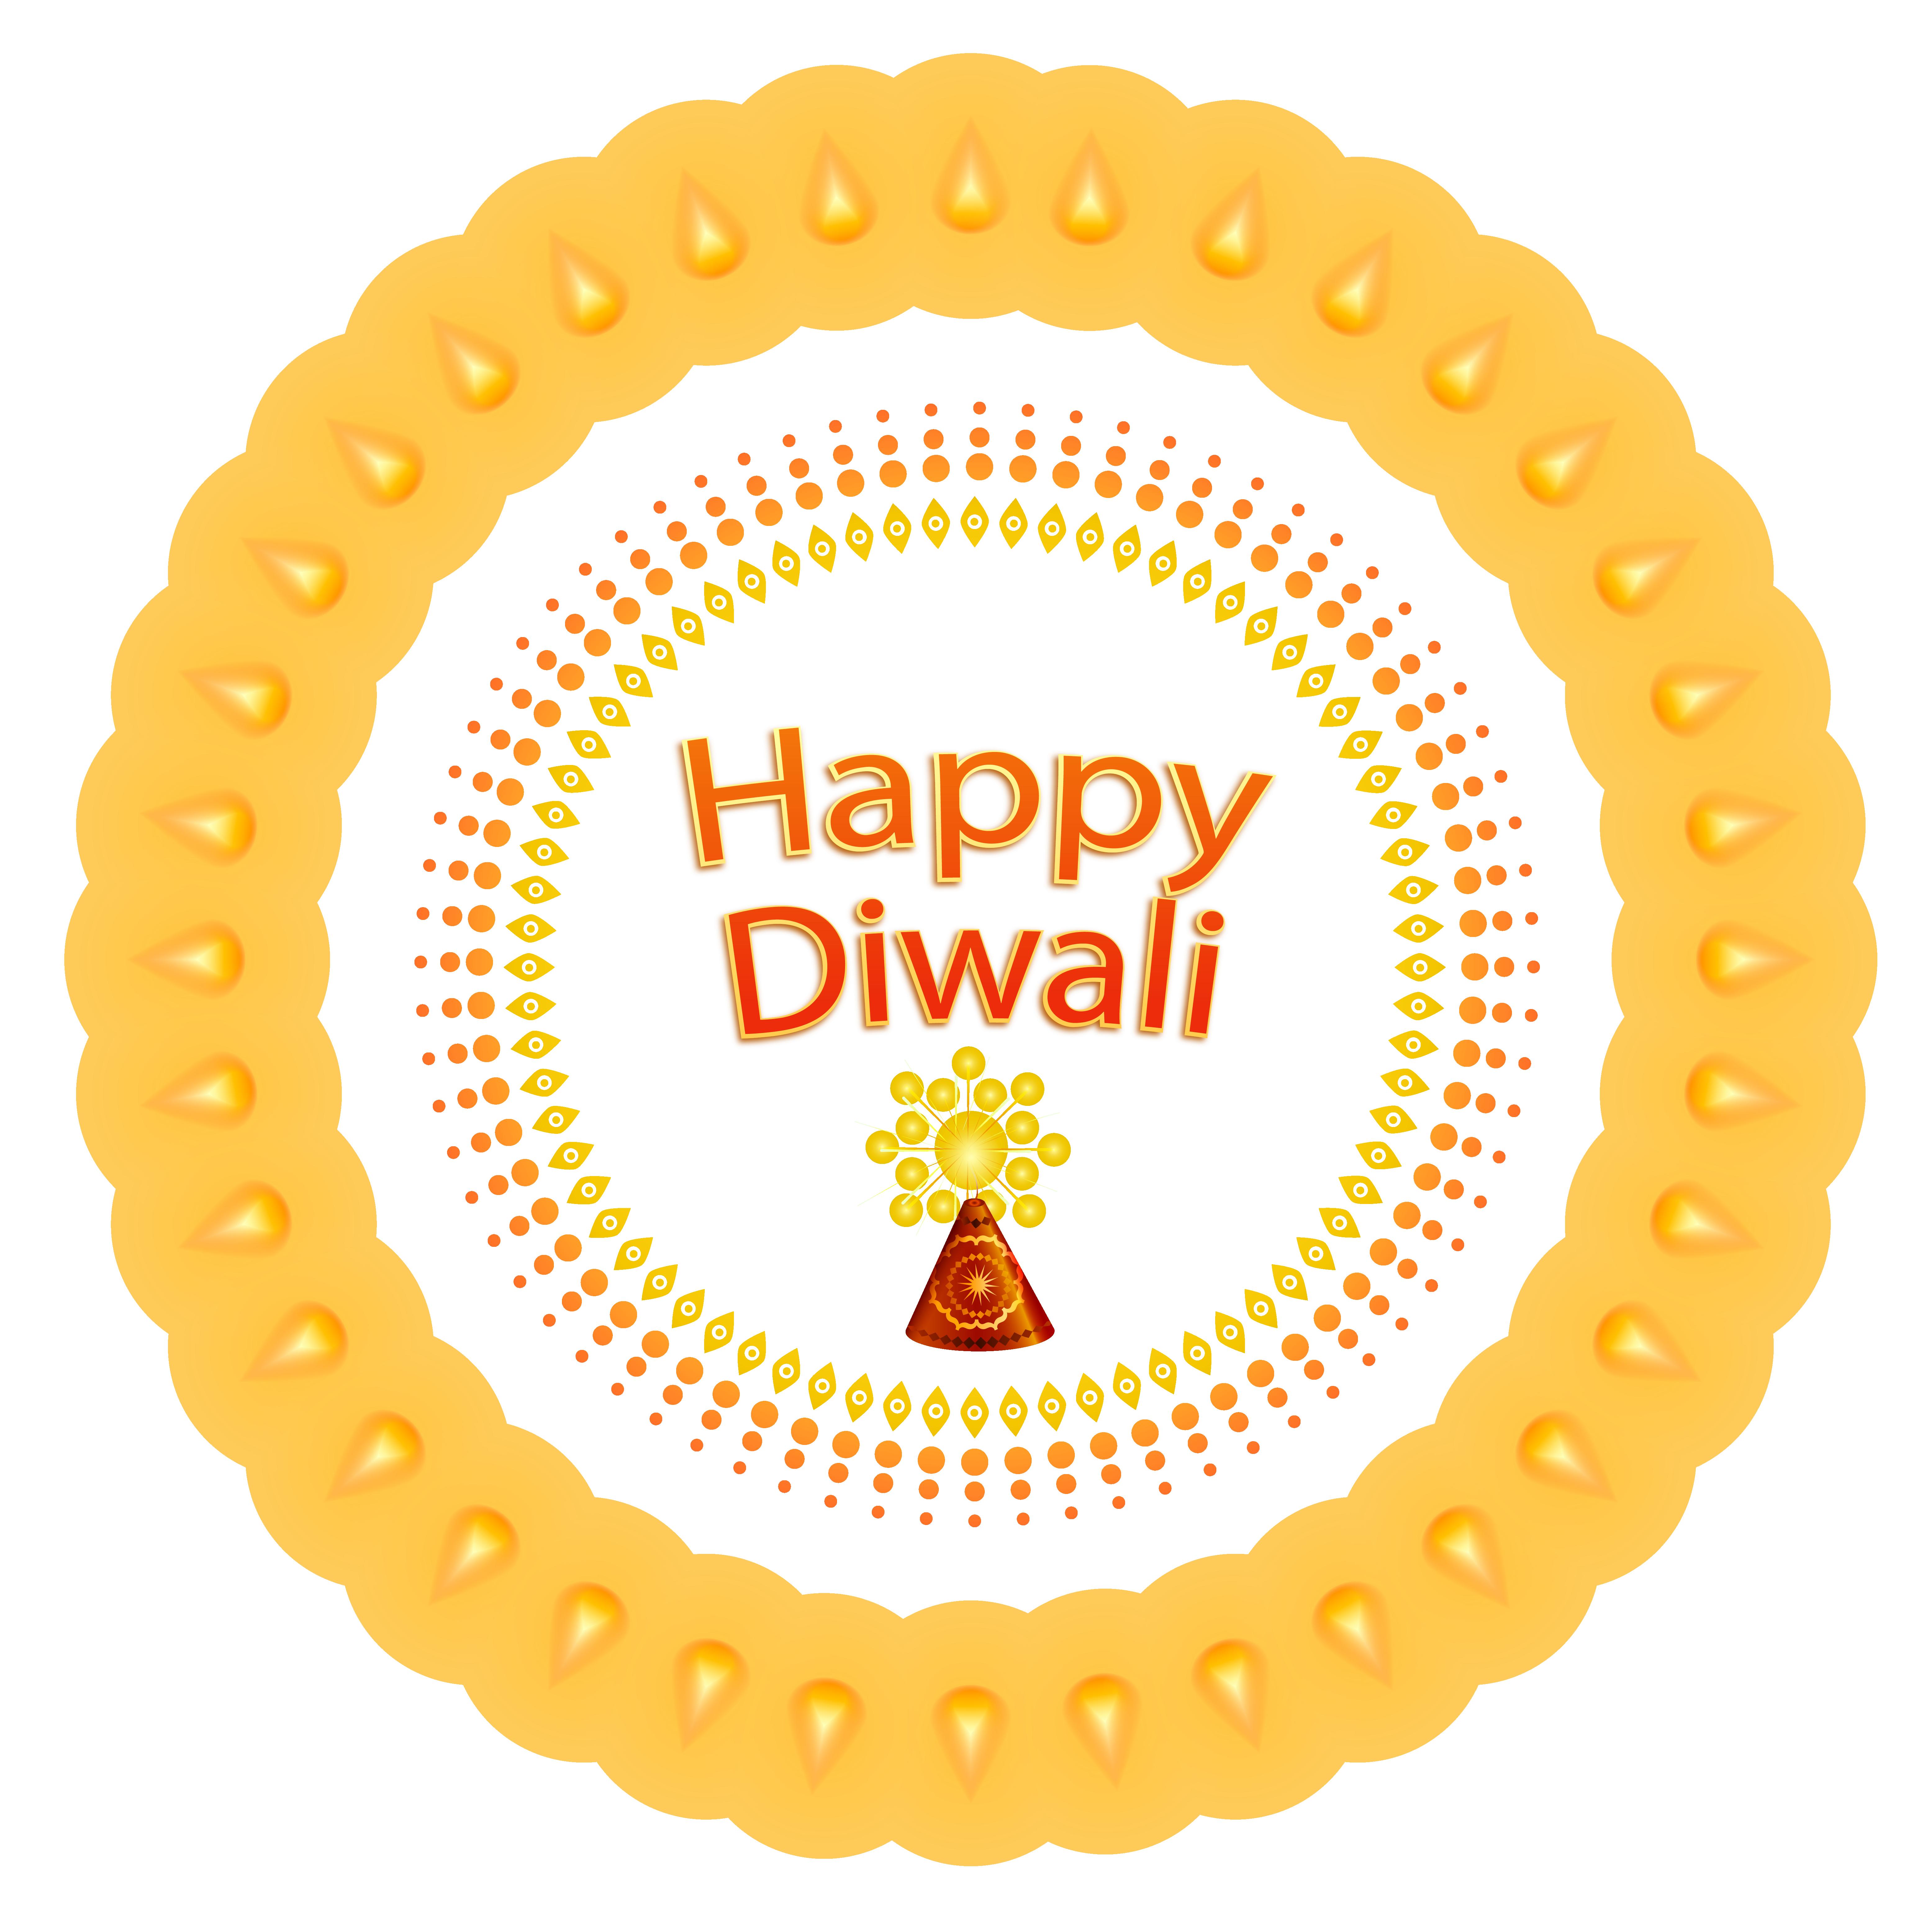 Happy Diwali Decoration PNG Image.